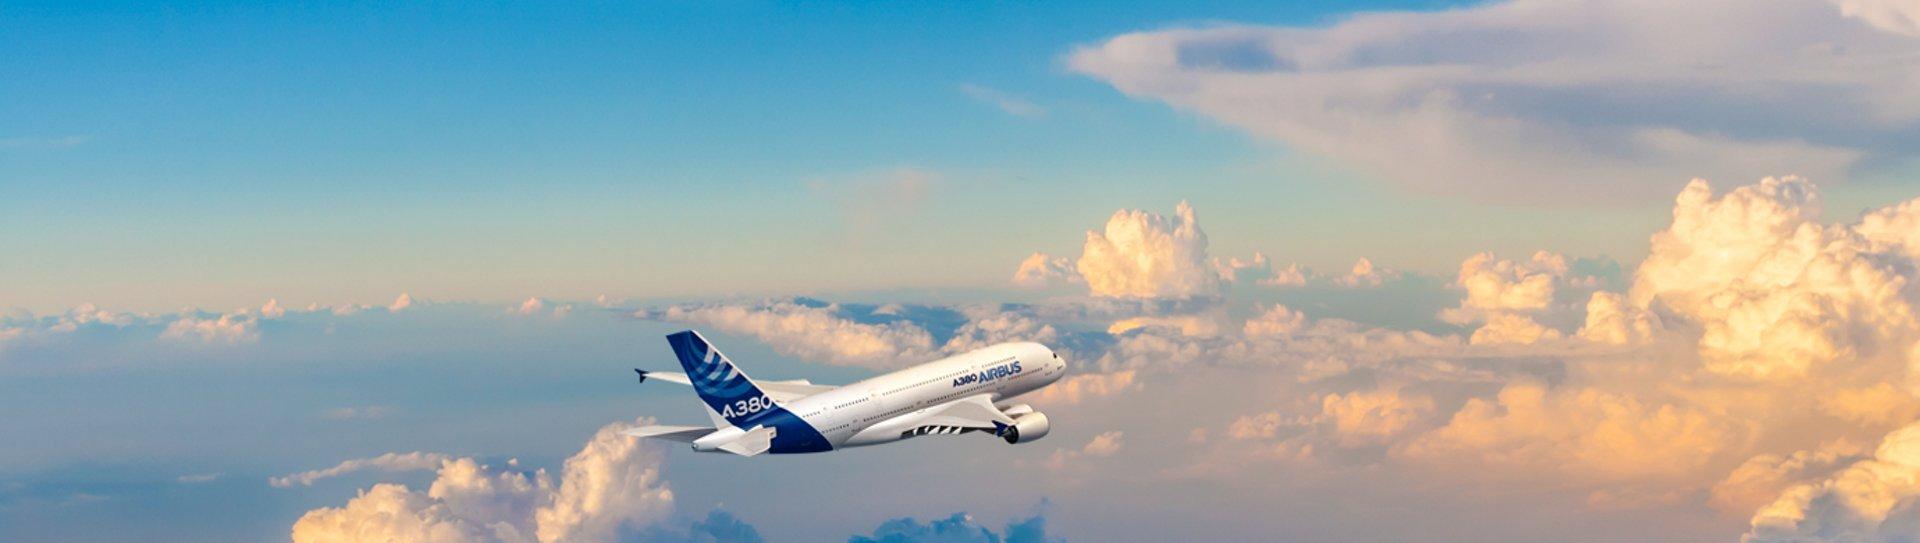 Environment A380 Airbus